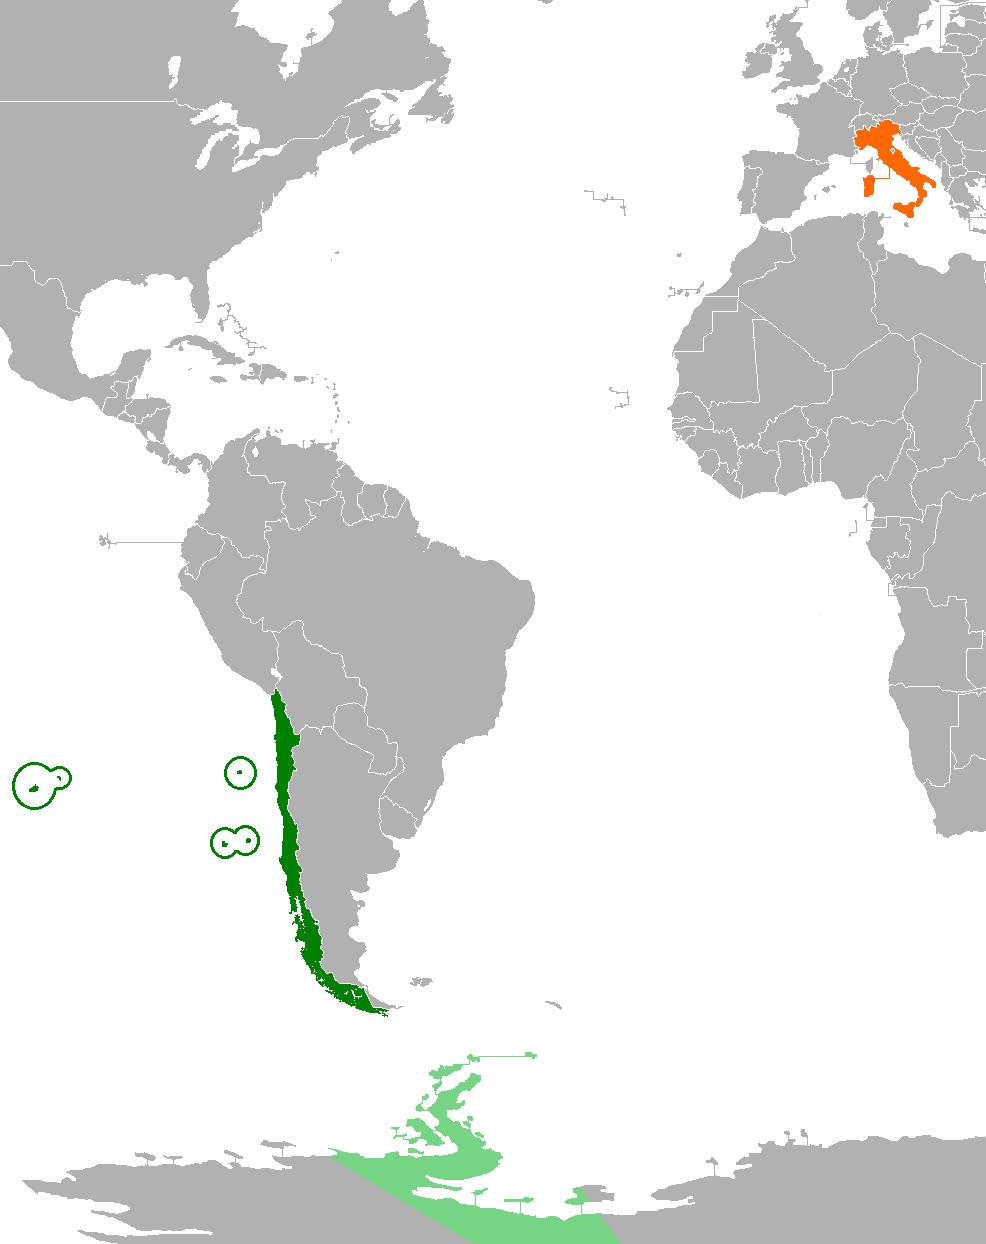 FileChile Italy Locatorpng Wikimedia Commons – Map World Italy